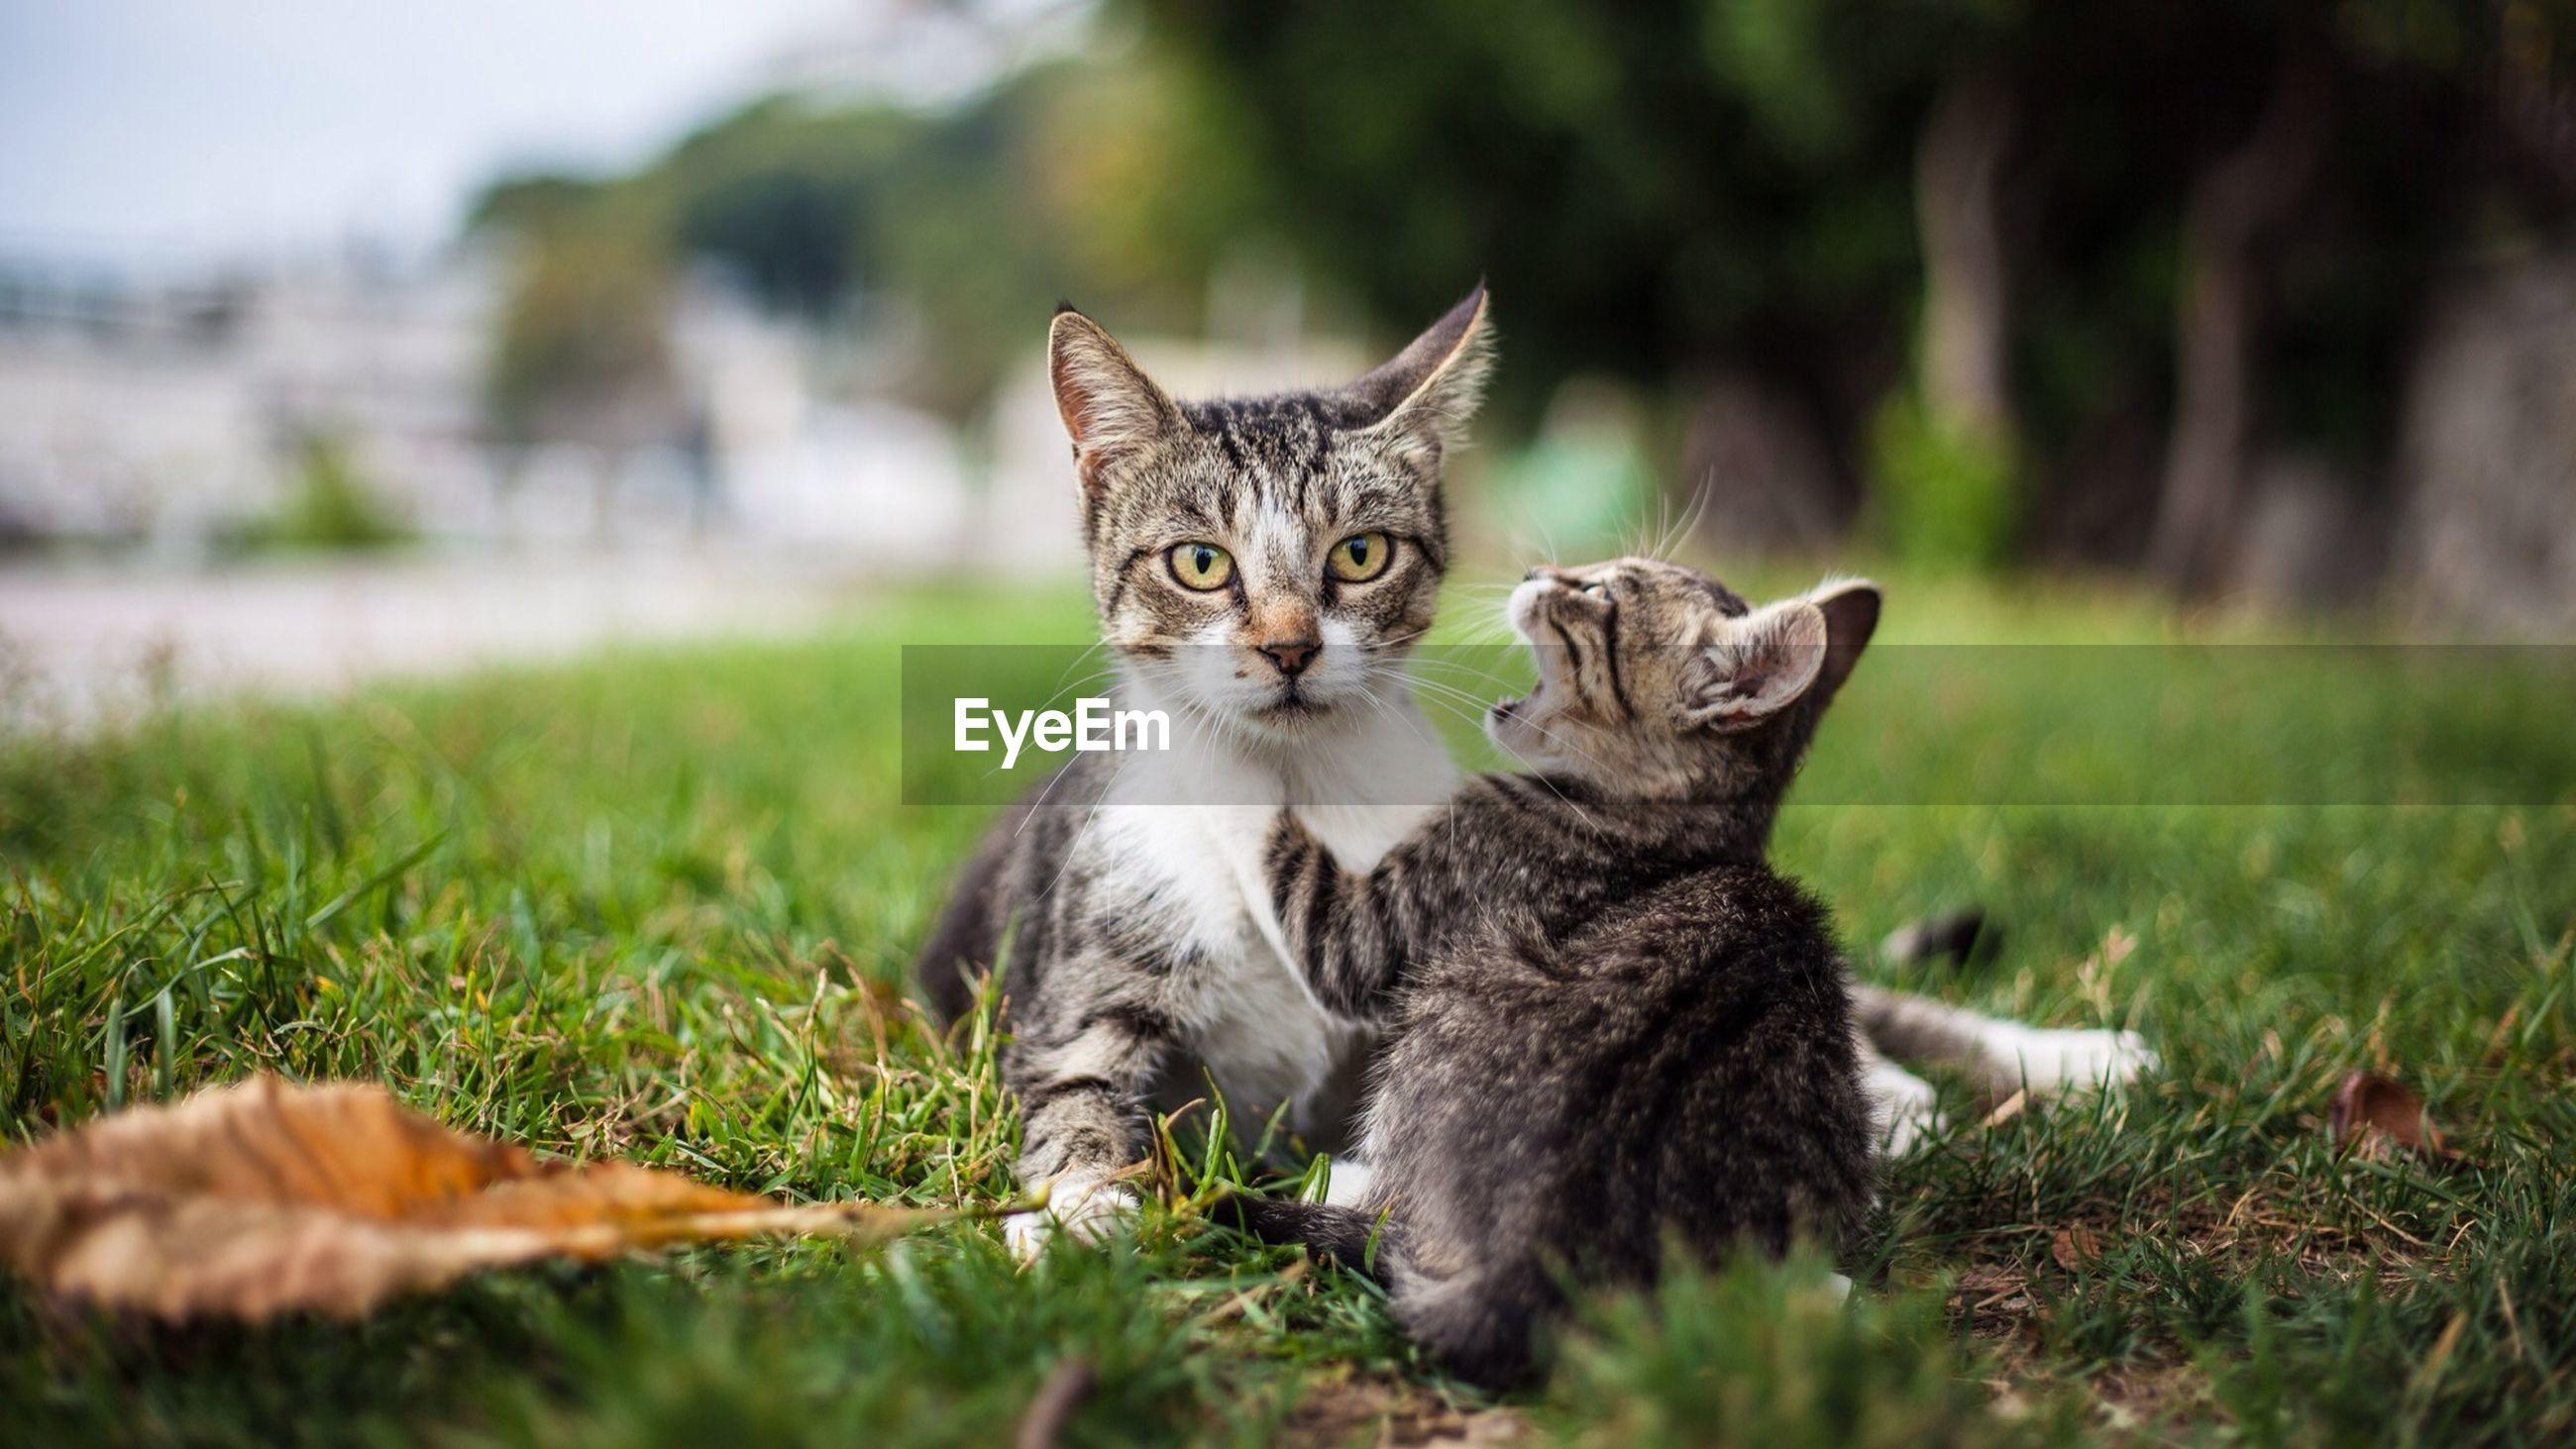 Portrait of cat with kitten in park